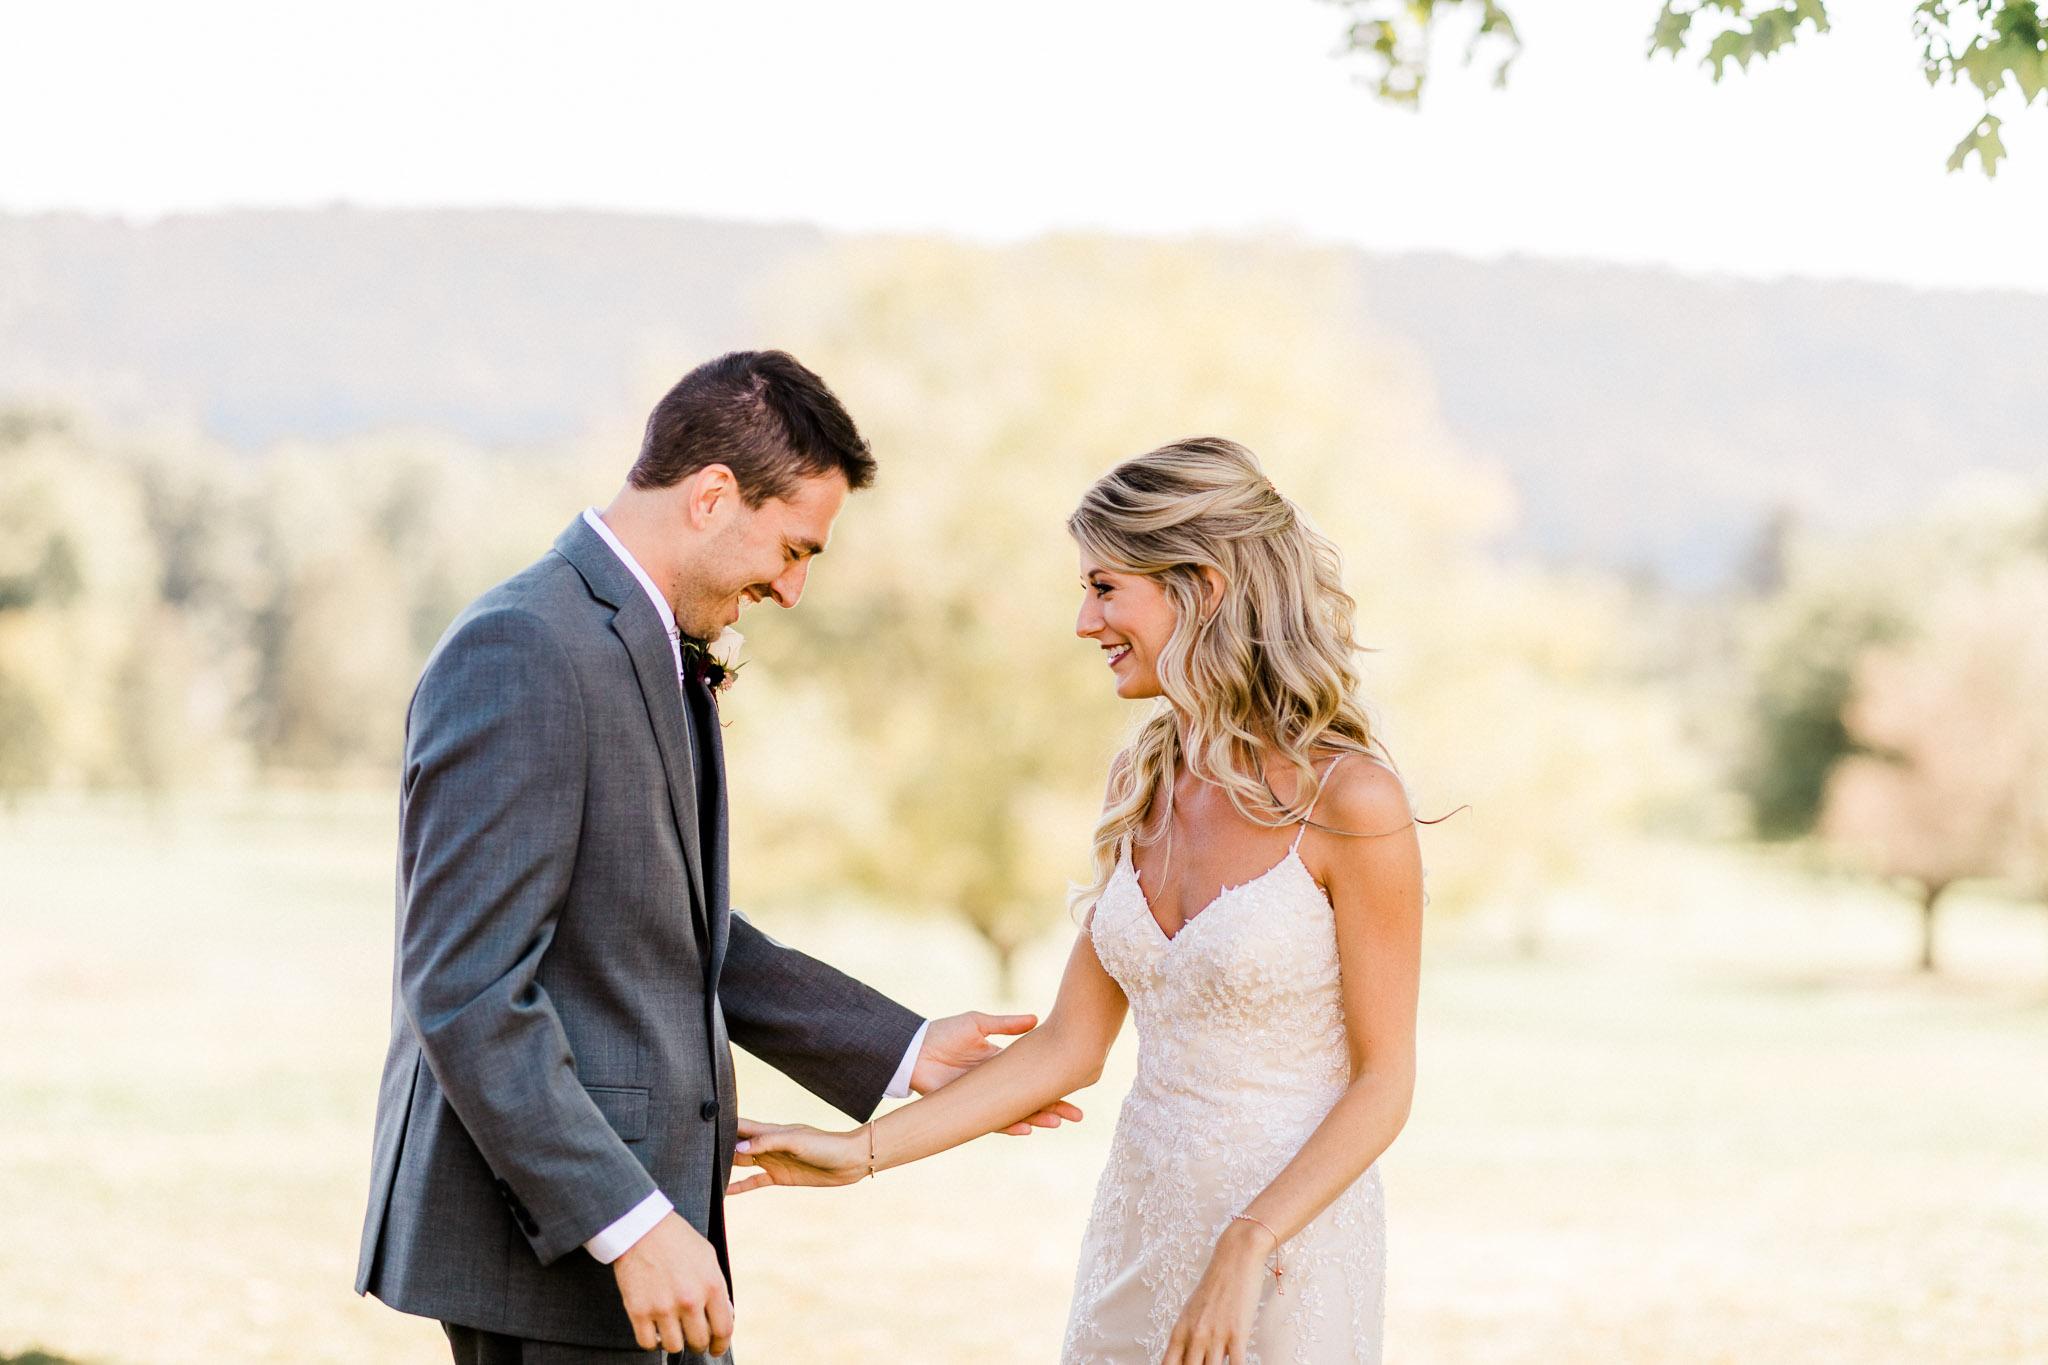 Frosty-Valley-September-Wedding-7198.jpg